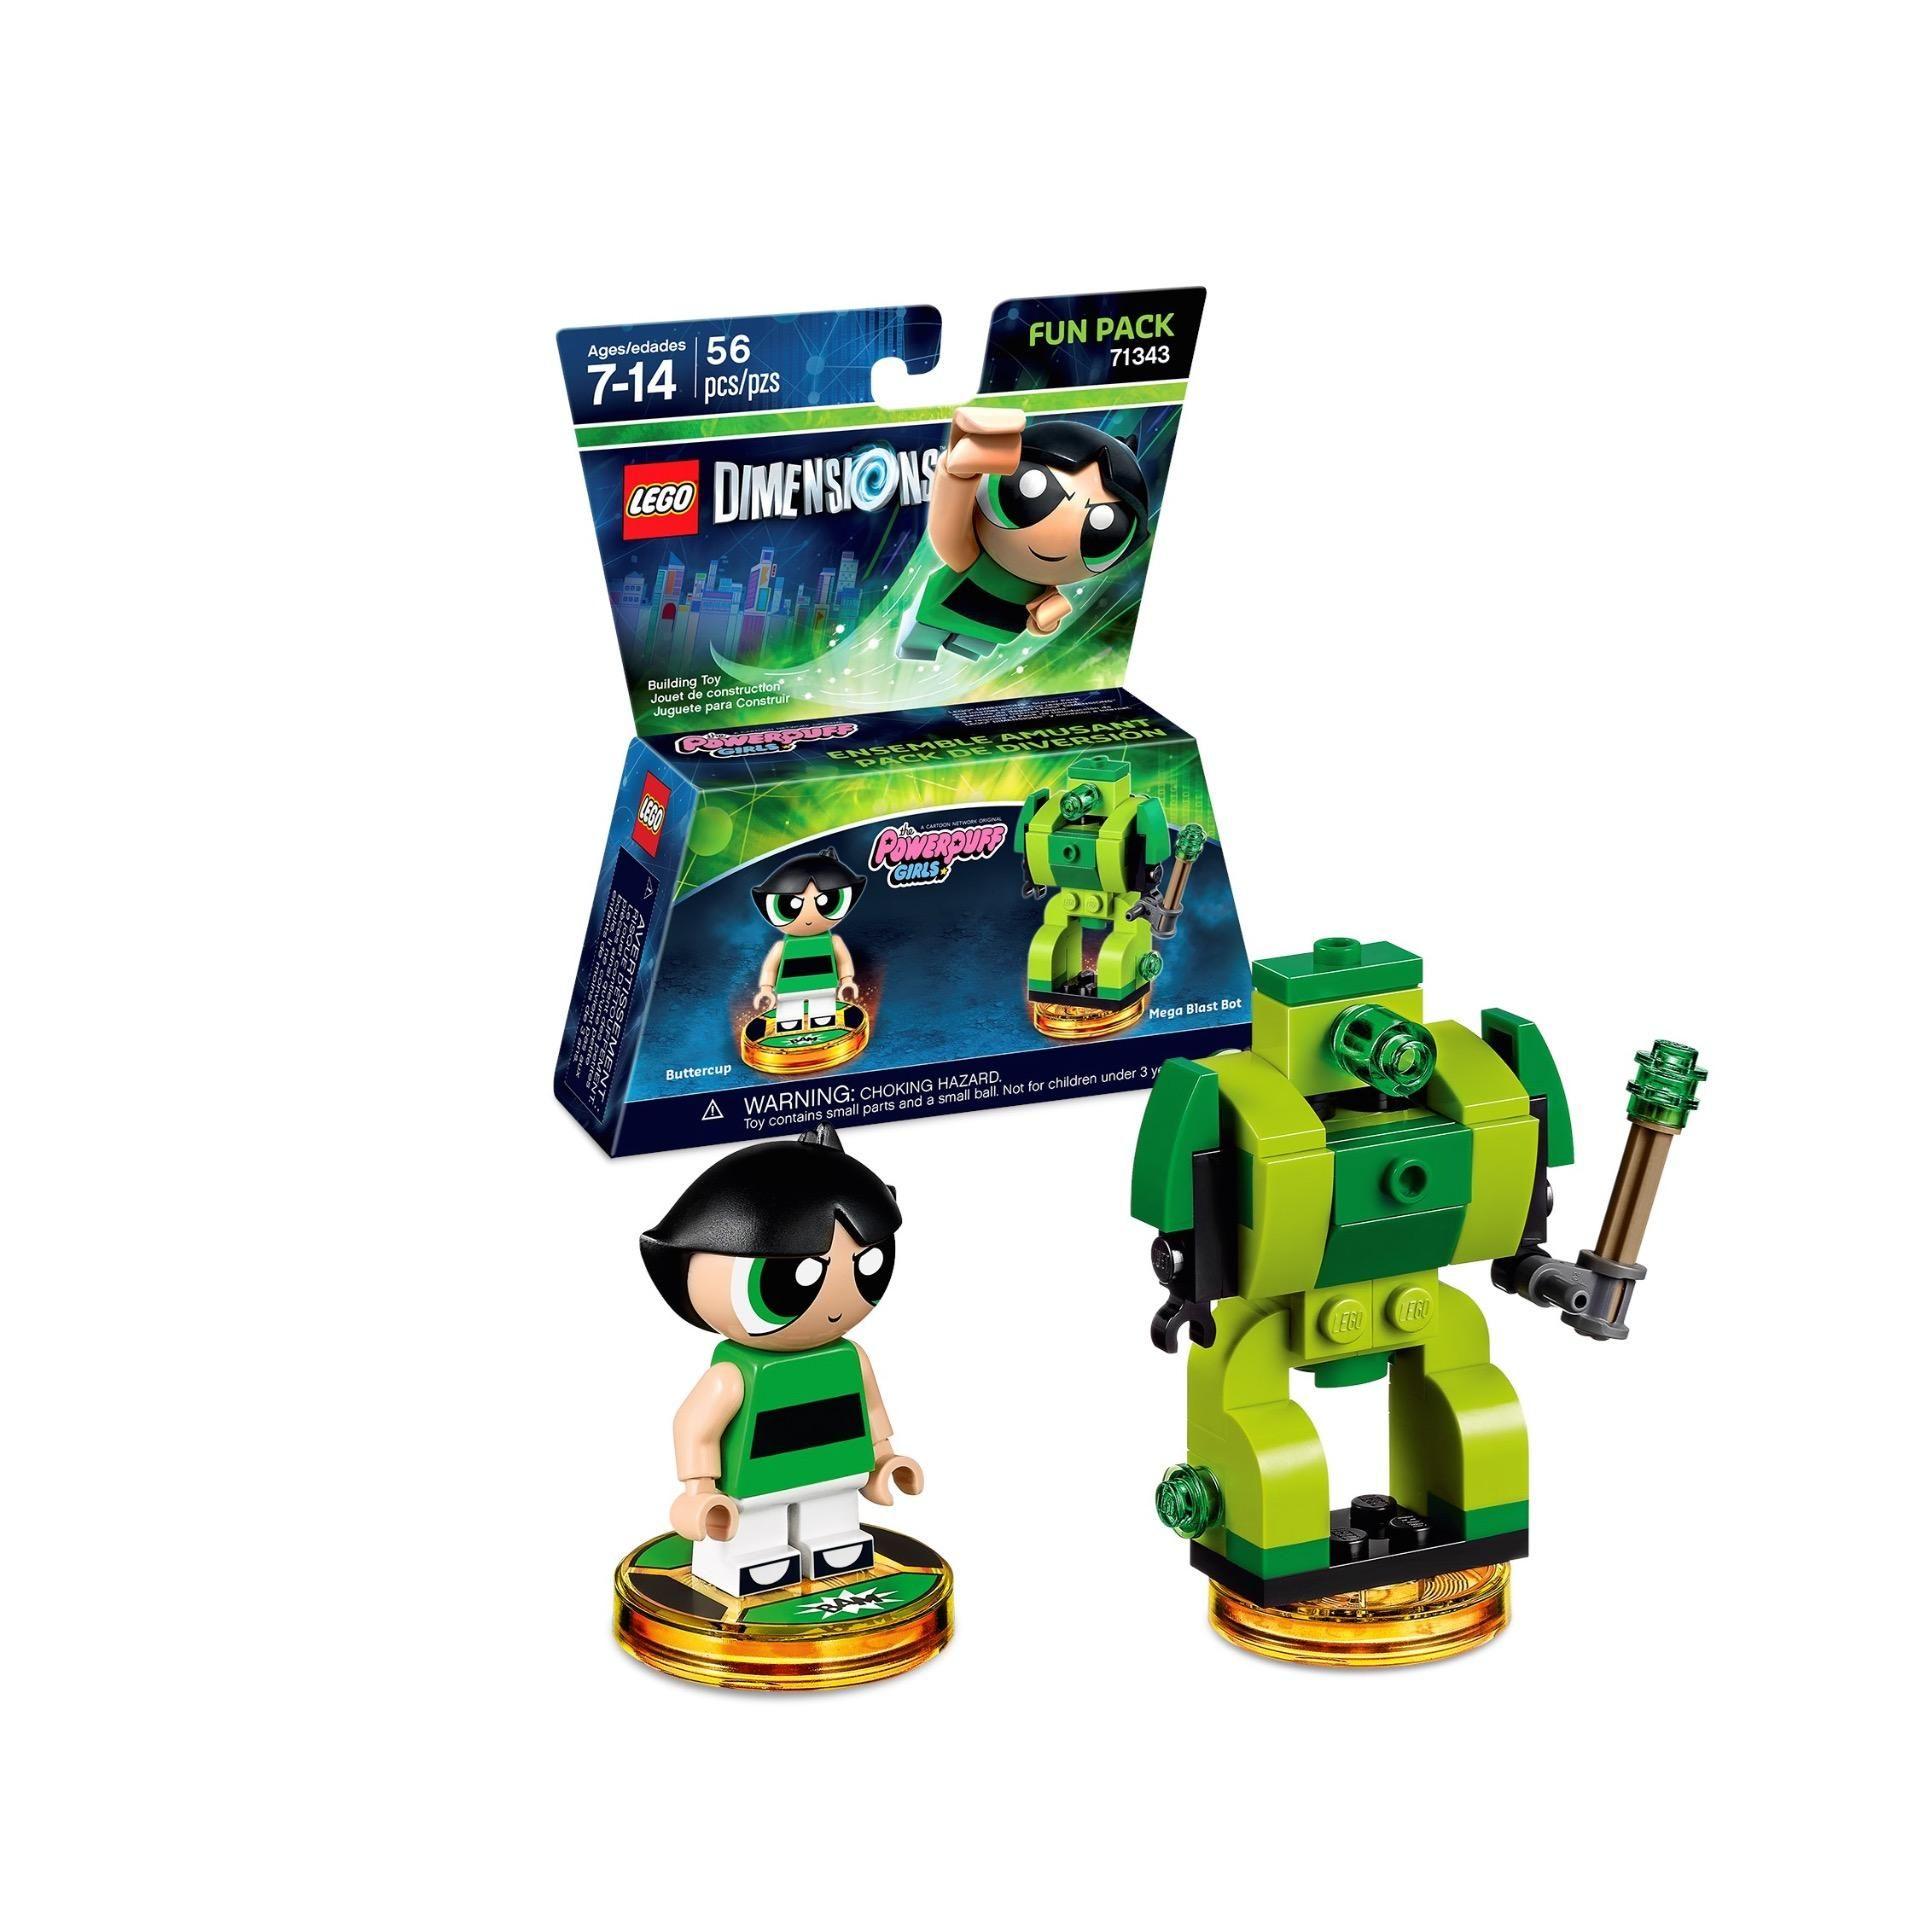 The PowerPuff Girls LEGO Dimensions MiniFigure Buttercup 71343